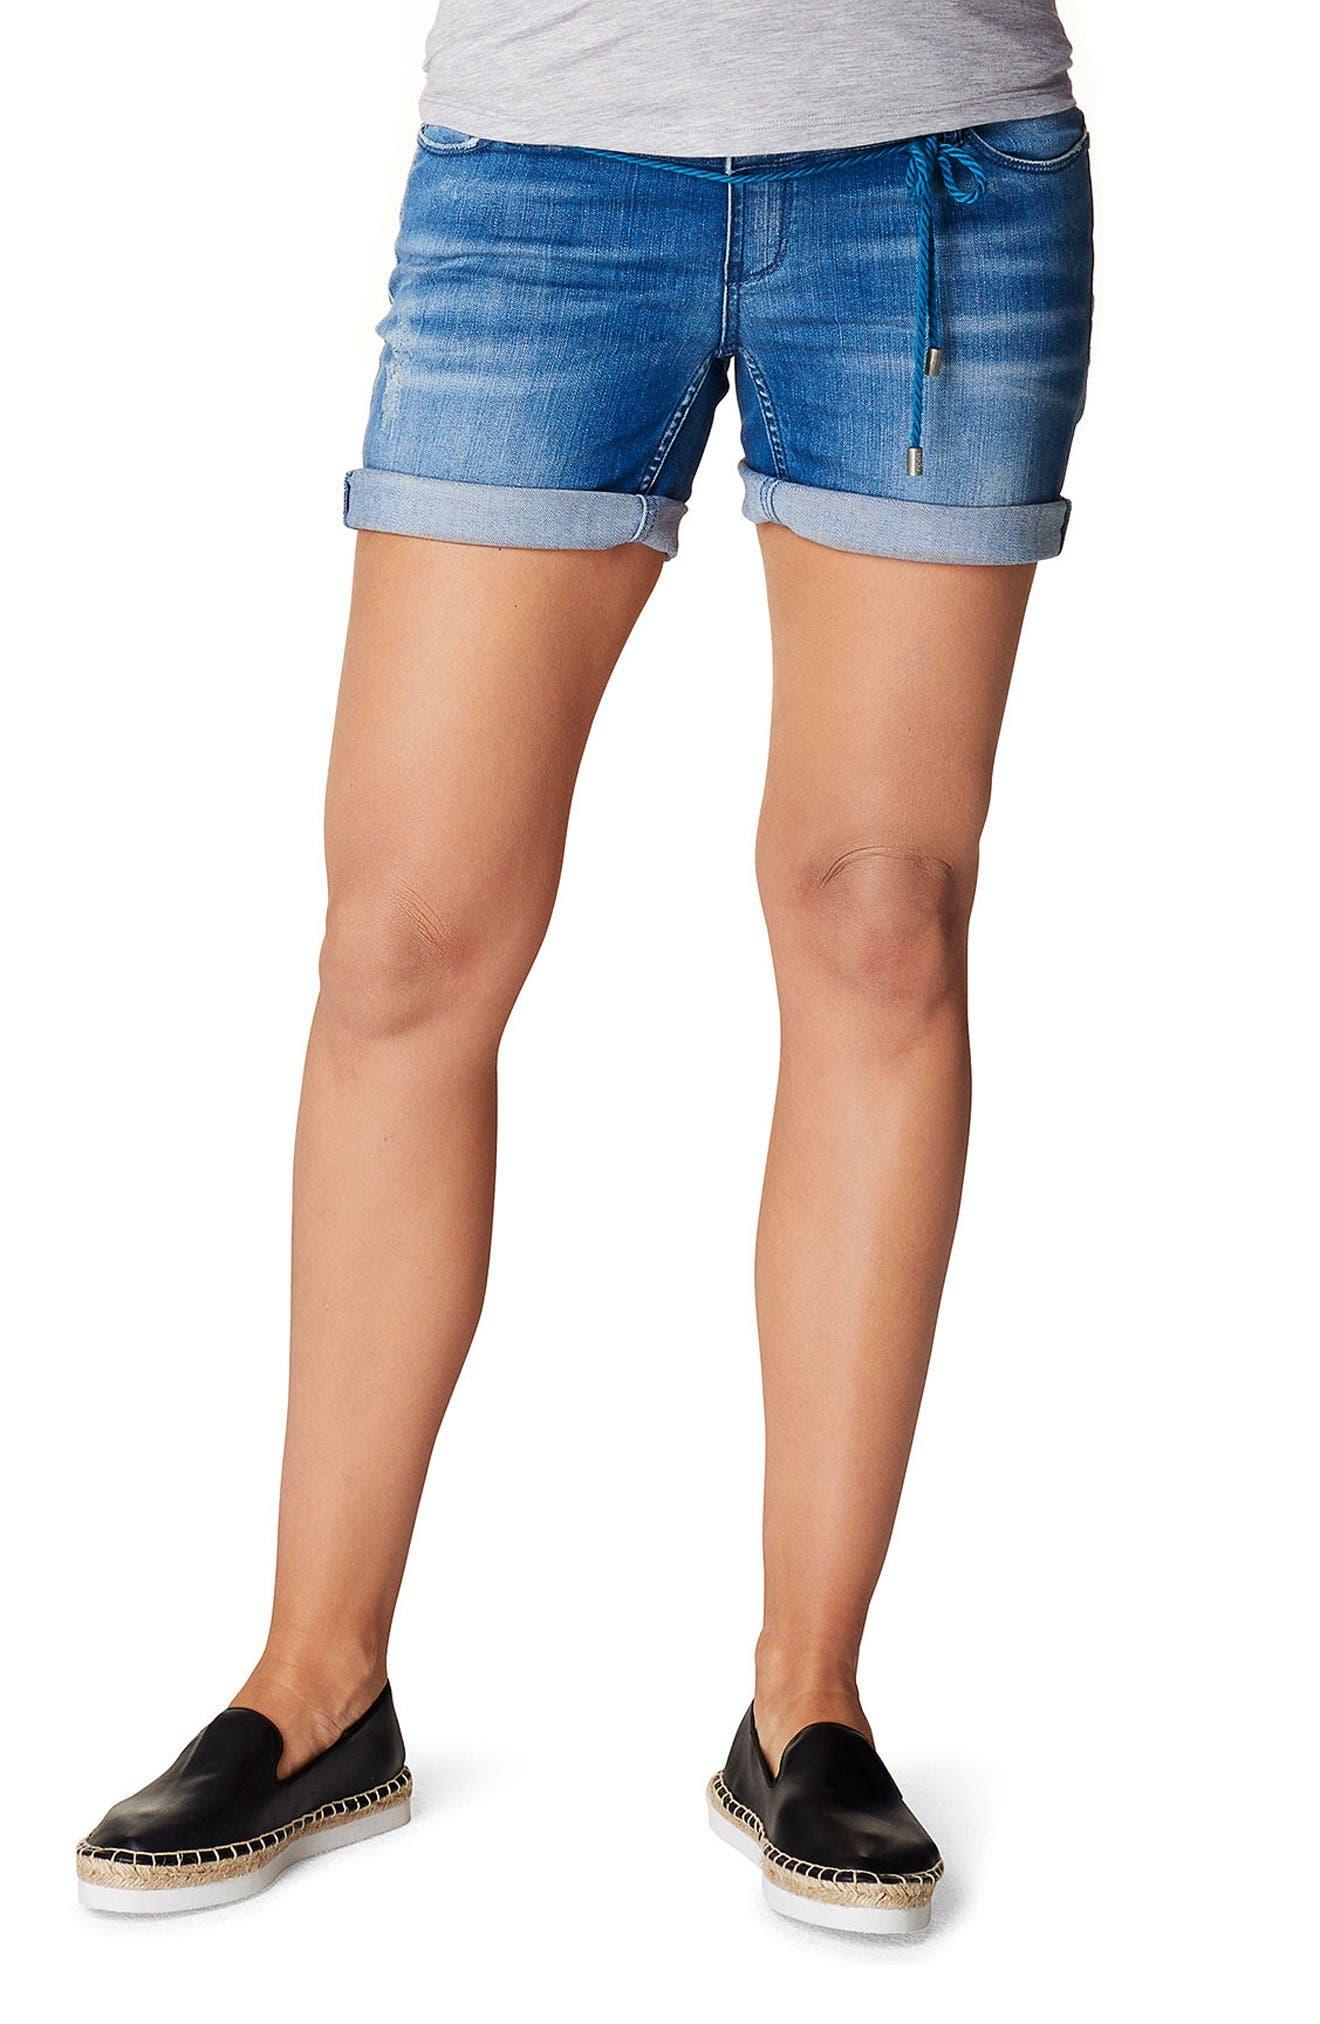 Alternate Image 1 Selected - Noppies Zita Maternity Jean Shorts